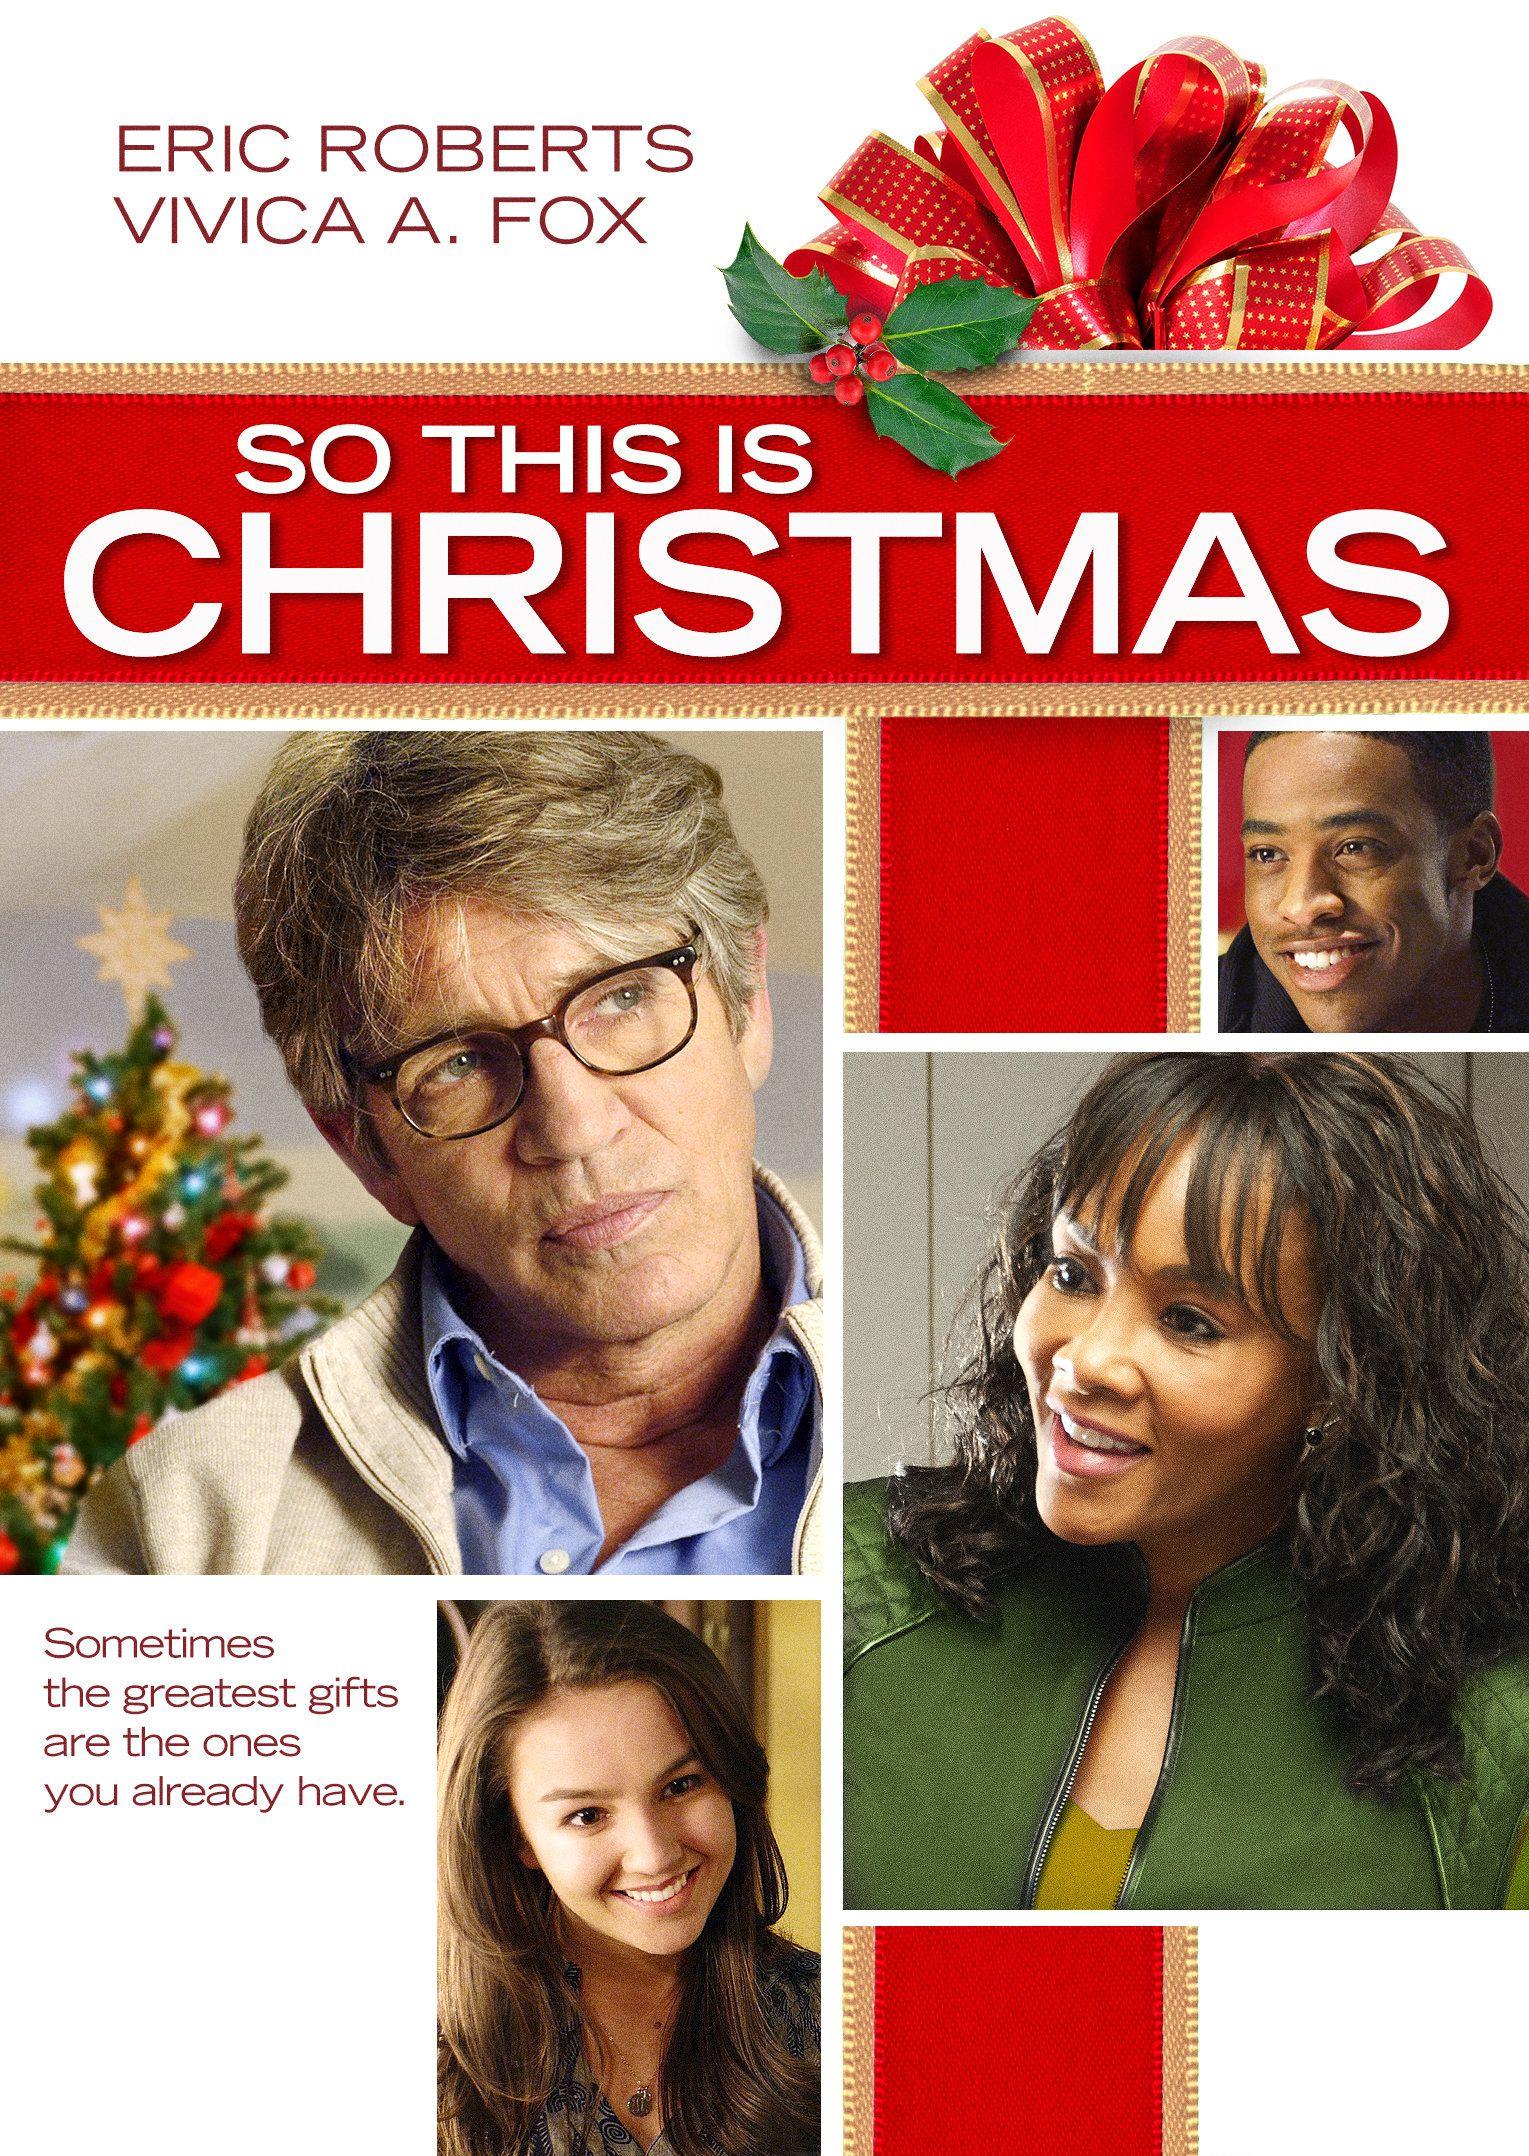 15 best christmas movies on hulu holiday films for 2018 hulu streaming - Best Christmas Movies On Hulu